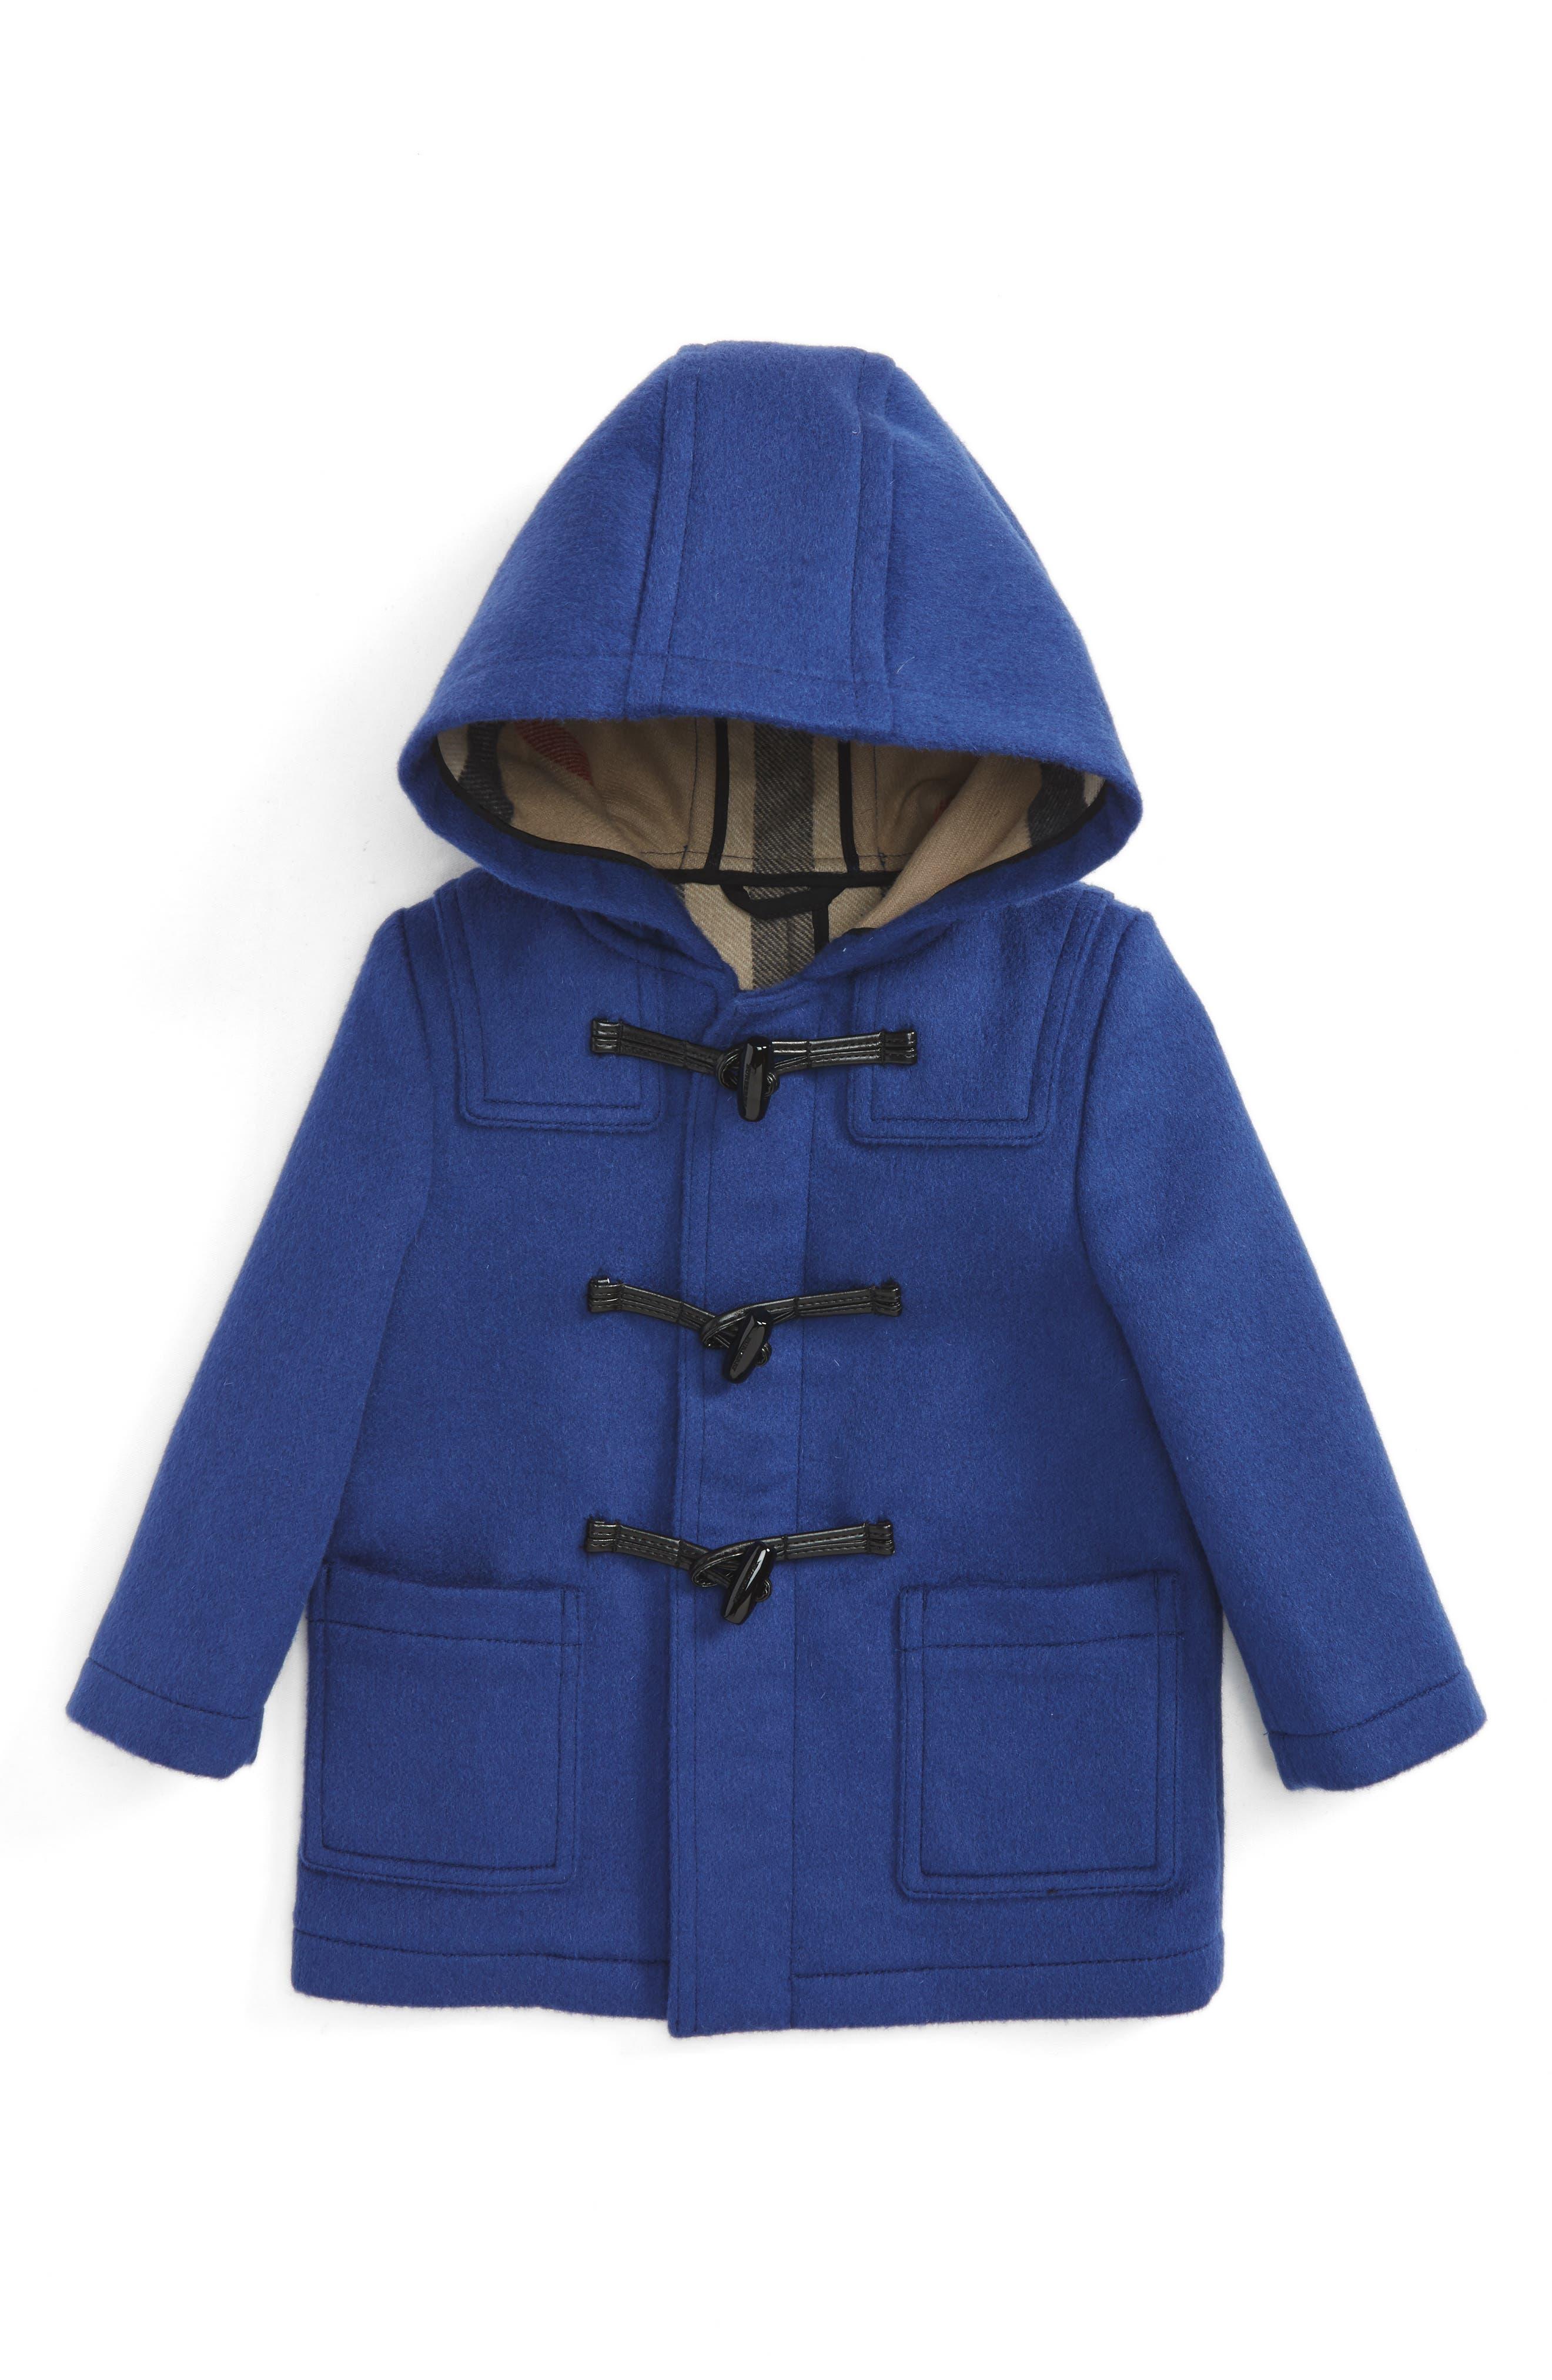 Alternate Image 1 Selected - Burberry Brogan Hooded Wool Toggle Coat (Baby Boys)